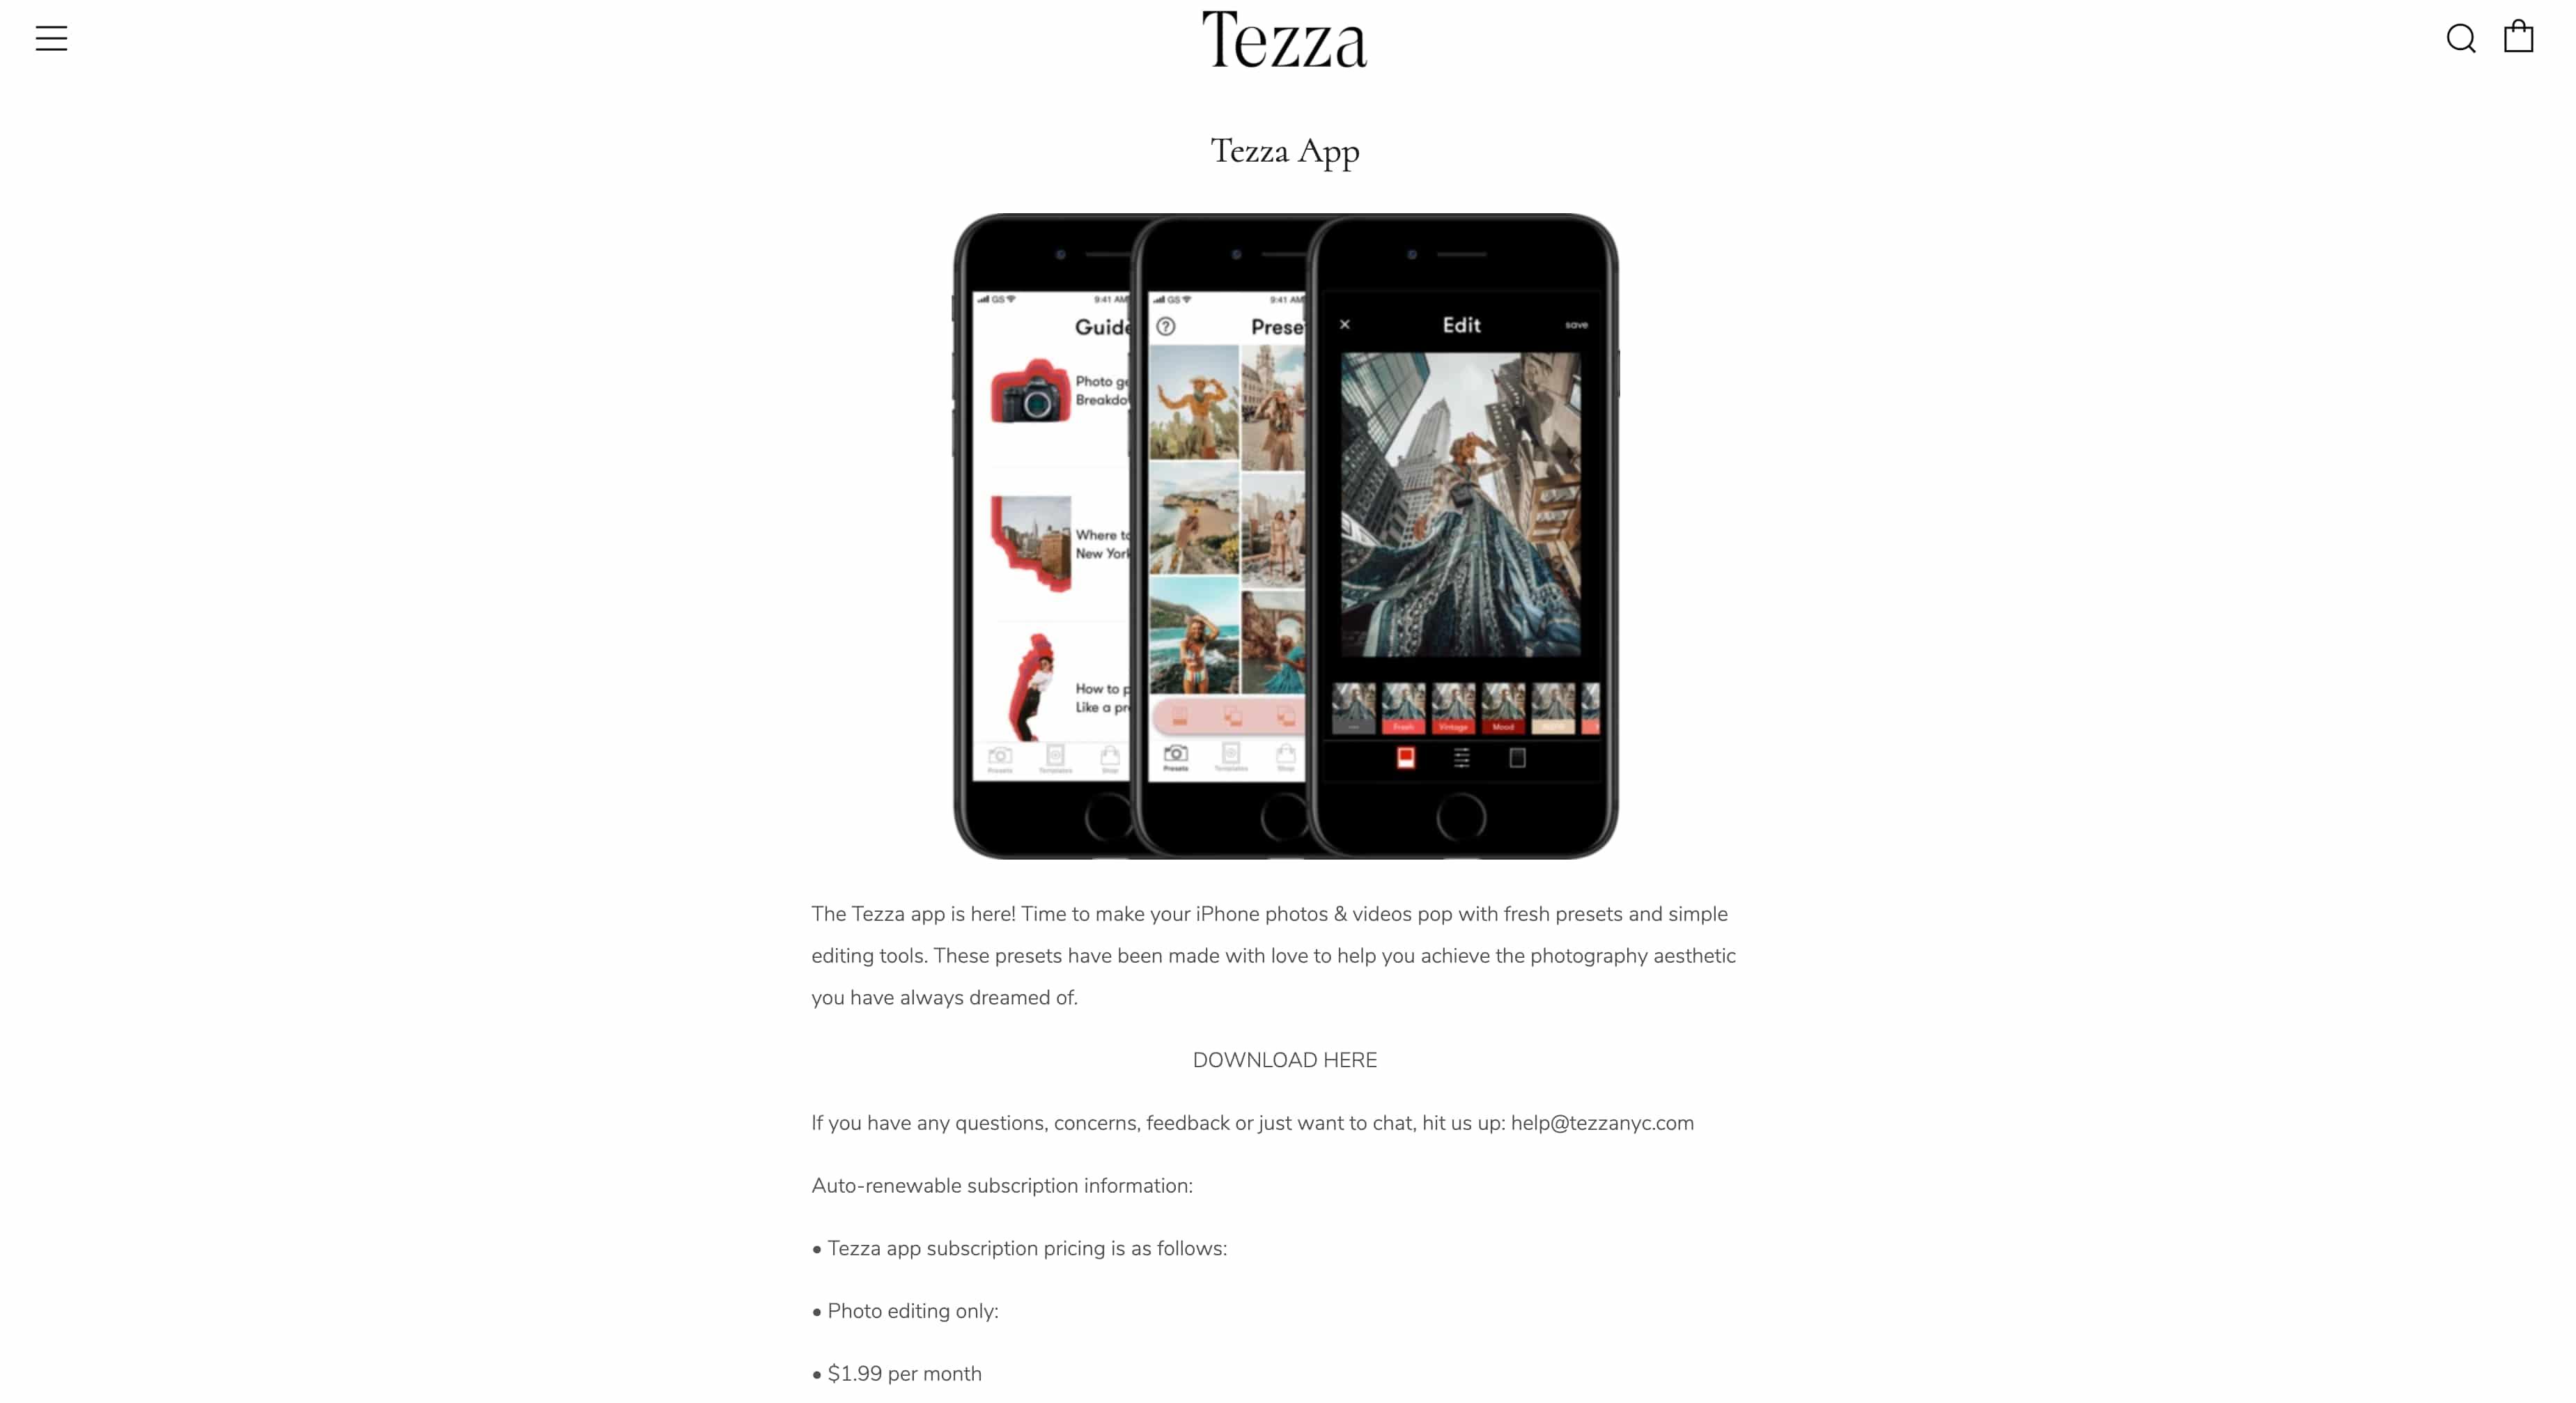 Aplicación Tezza: captura de pantalla del sitio web